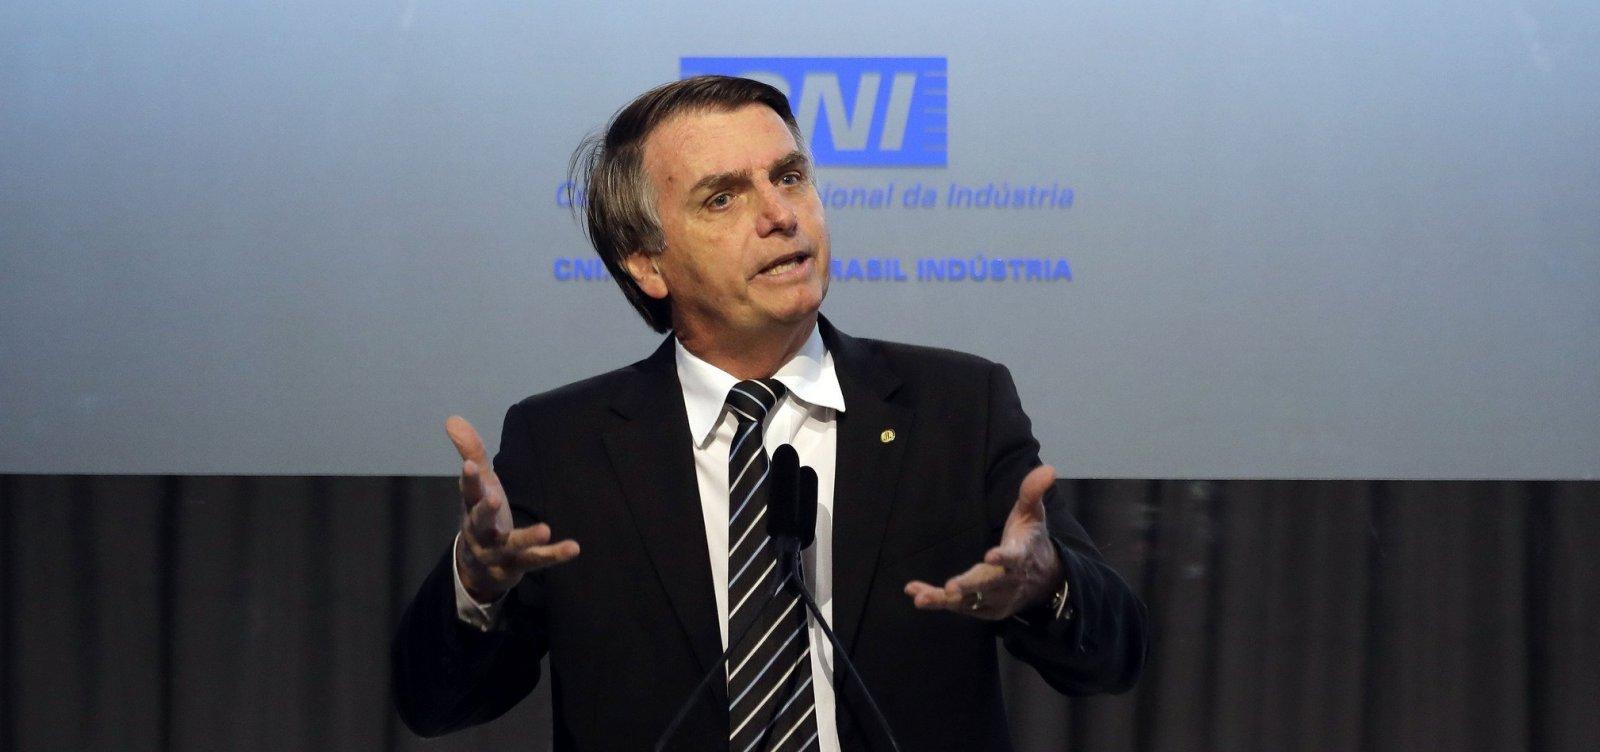 [Bolsonaro e Moro marcam encontro no Rio de Janeiro]